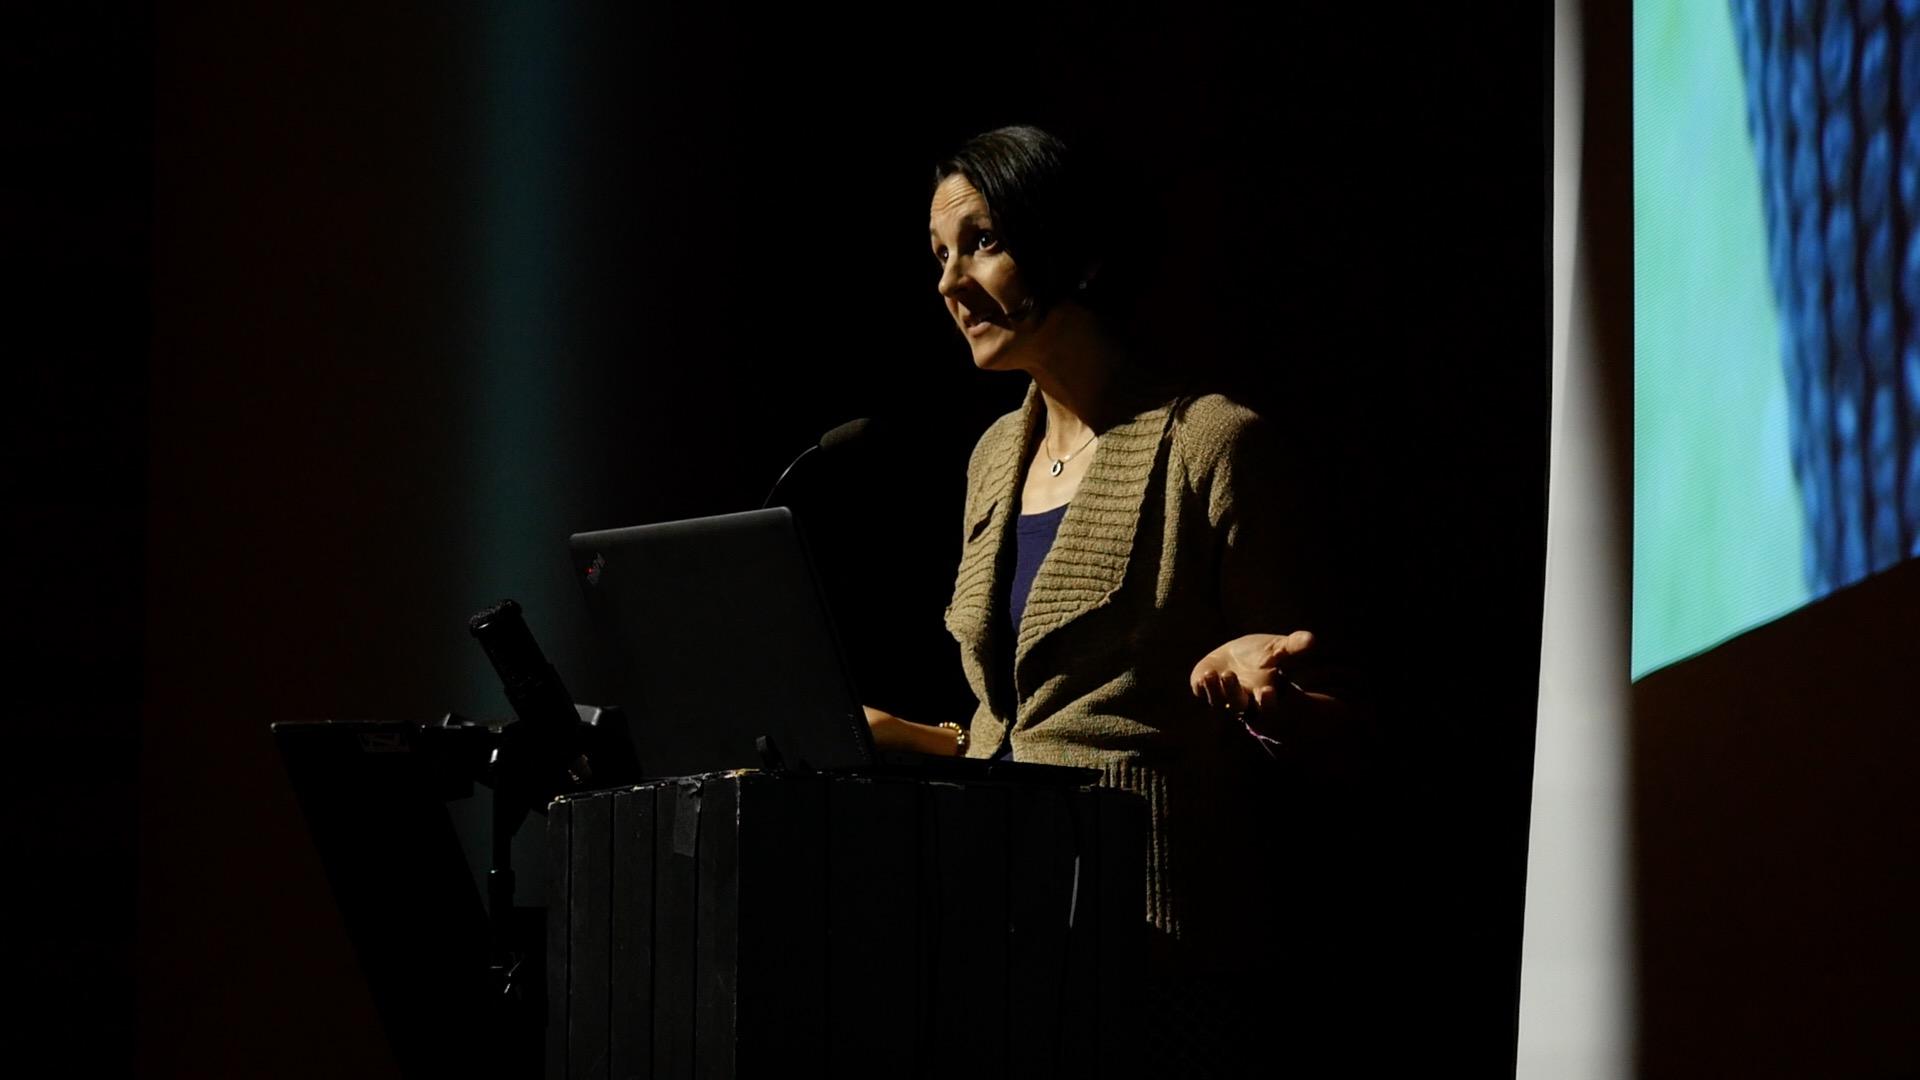 Dr. Mariana Brussoni – Public Lecture